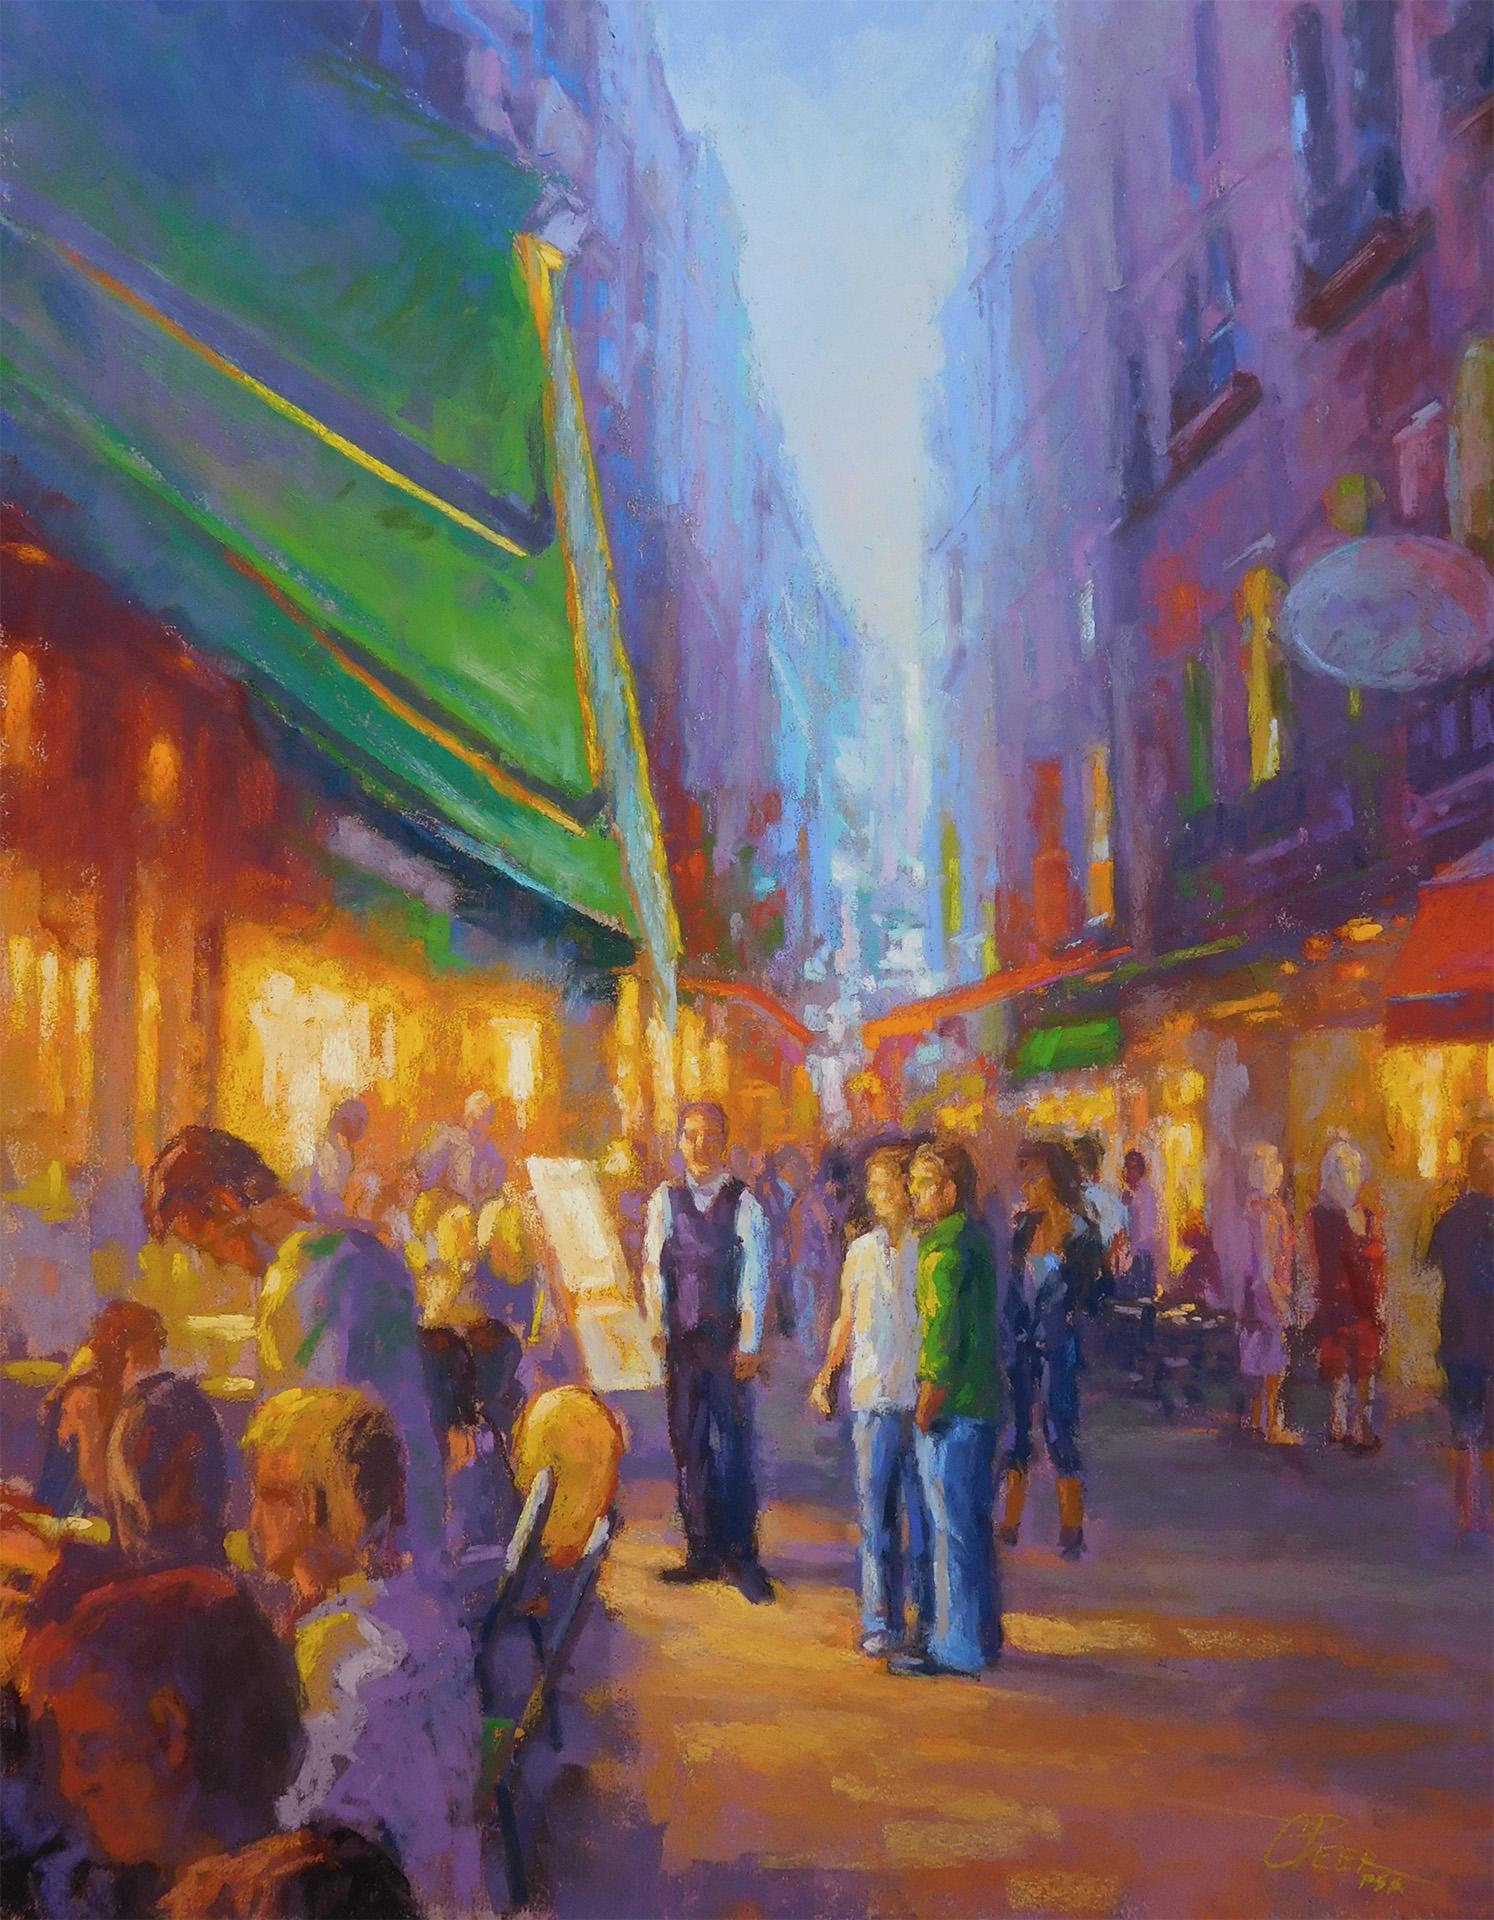 Evening Cafes: Dinner Time on a Venetian Street